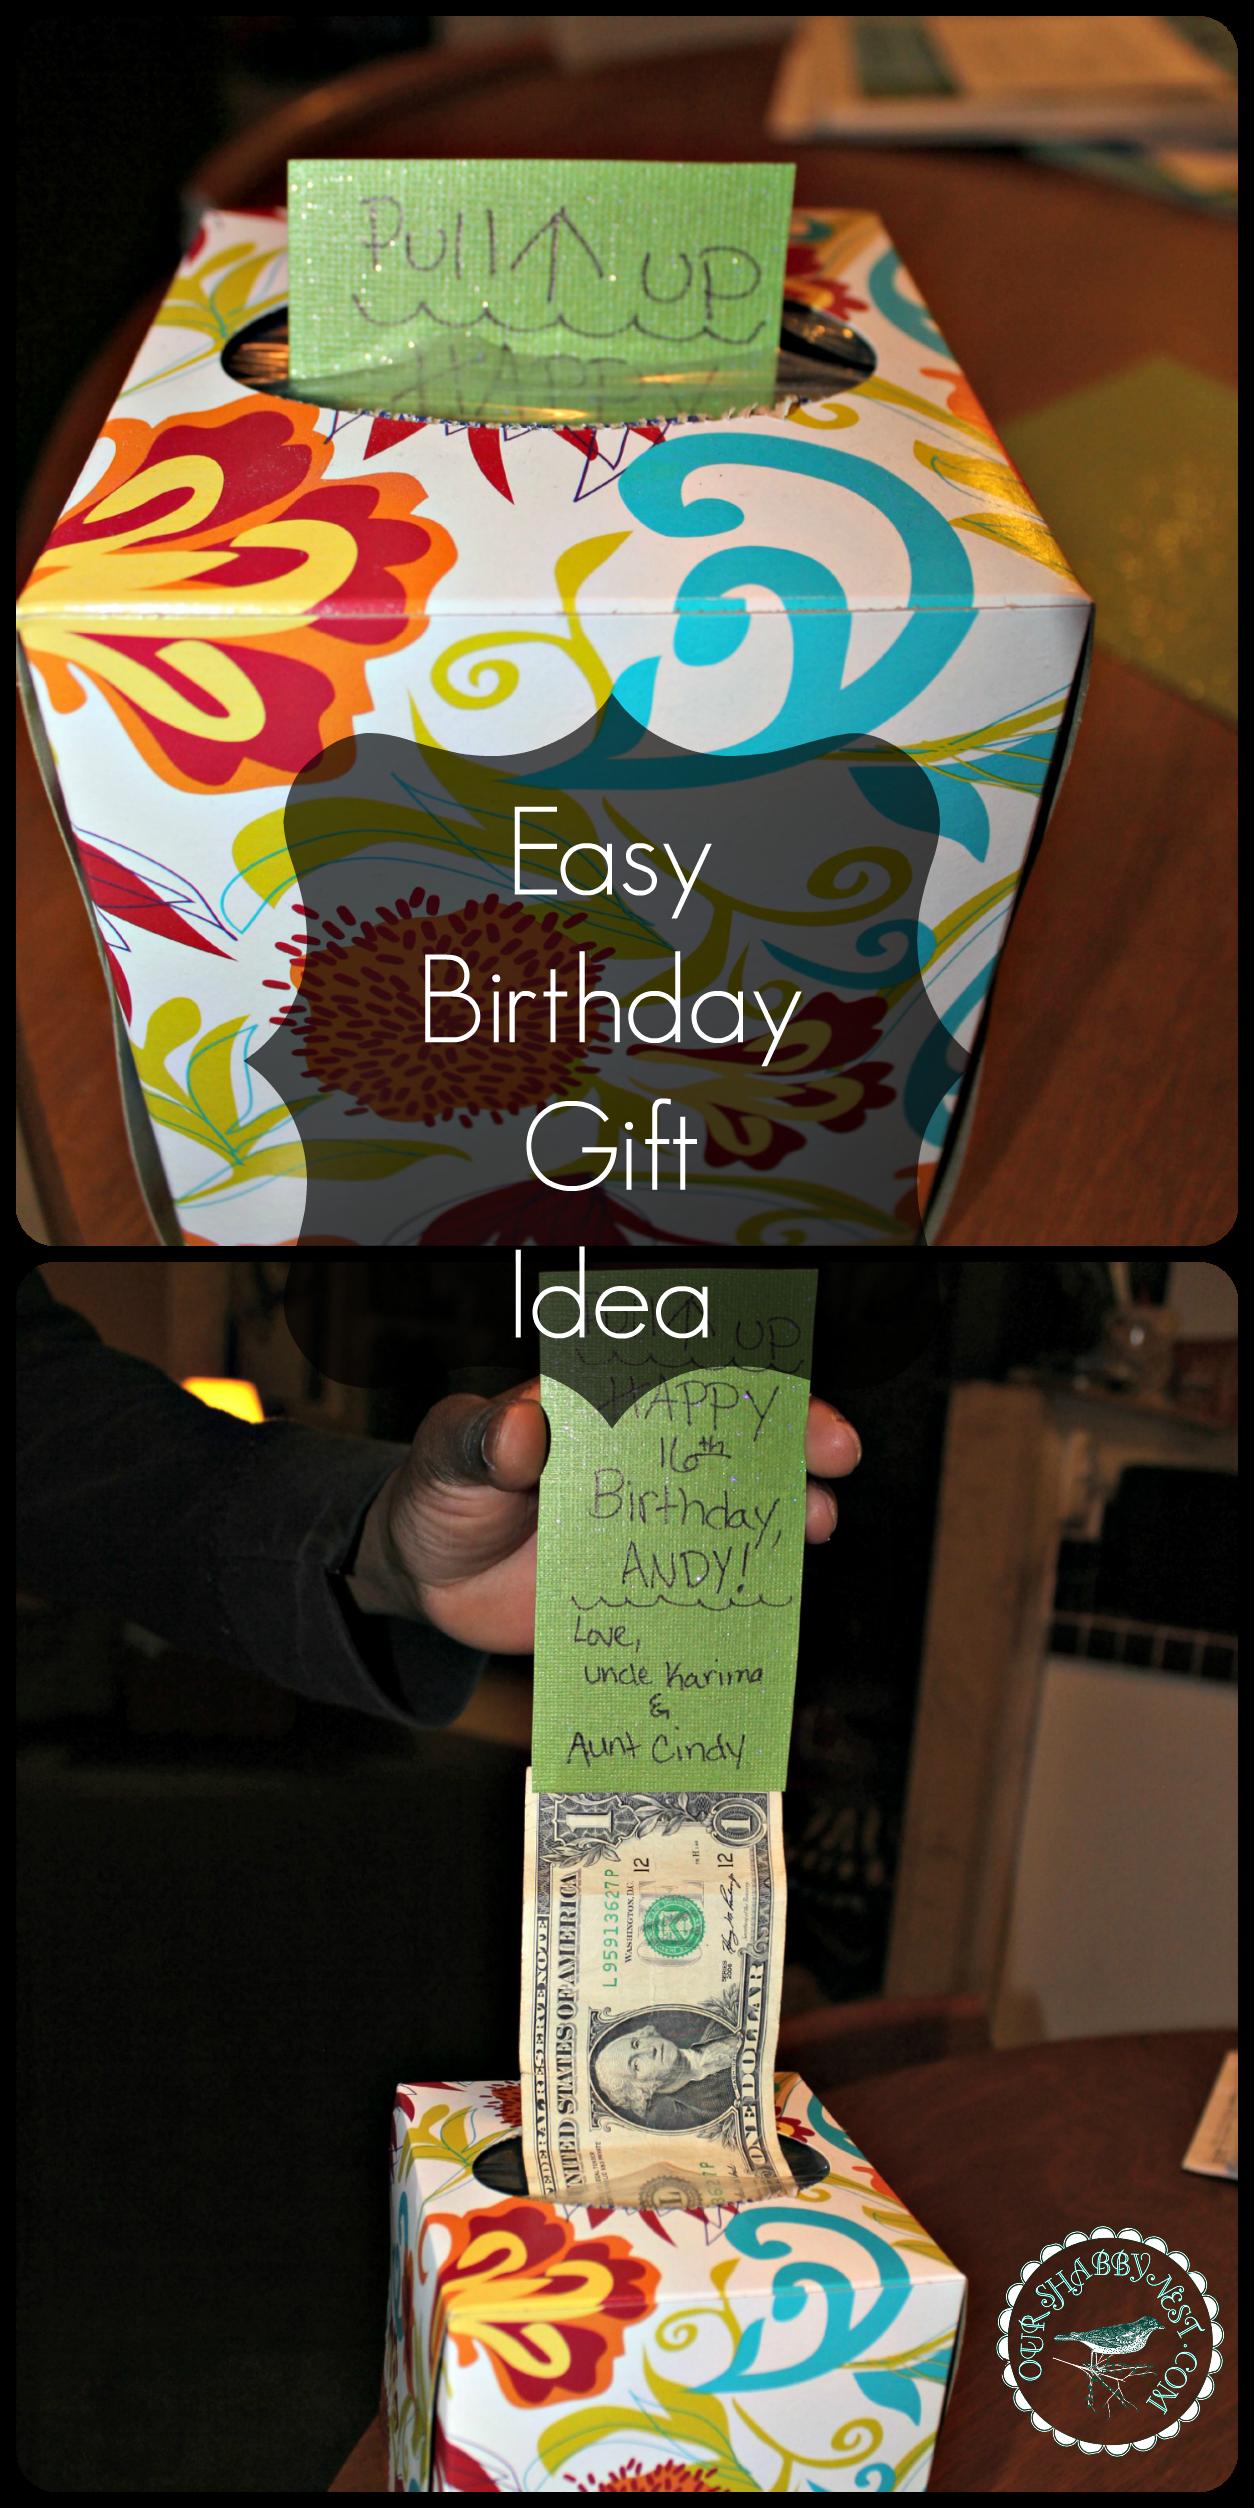 Birthday gift idea Money Homemade Gifts Pinterest Birthday